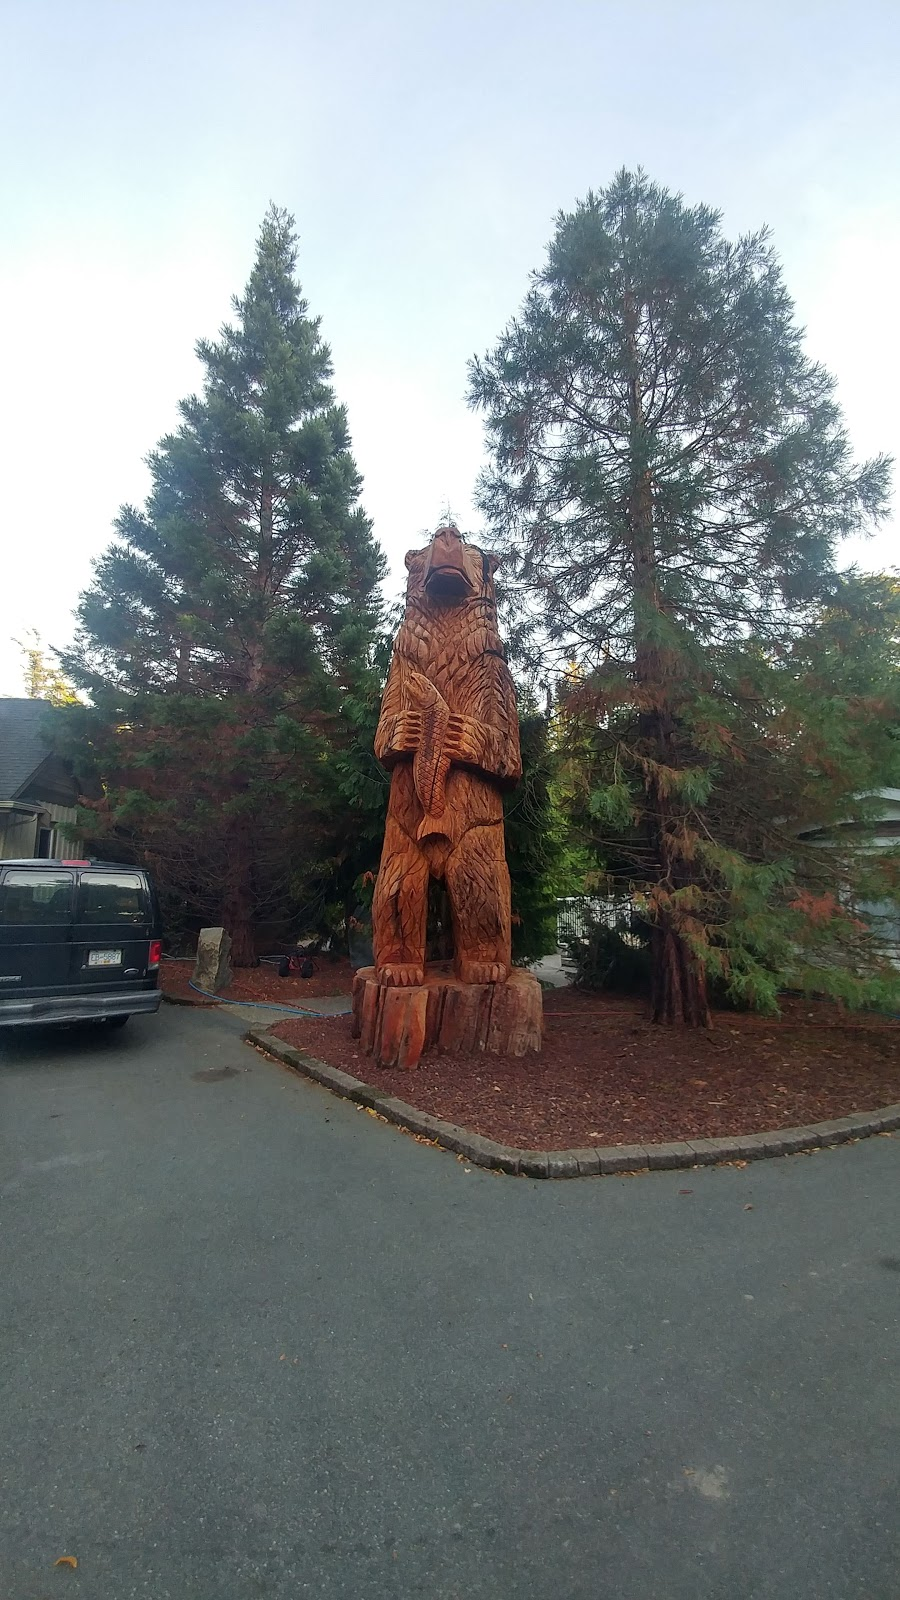 Pine Ridge Park 2270 196 St Langley City Bc V2z 1n6 Canada